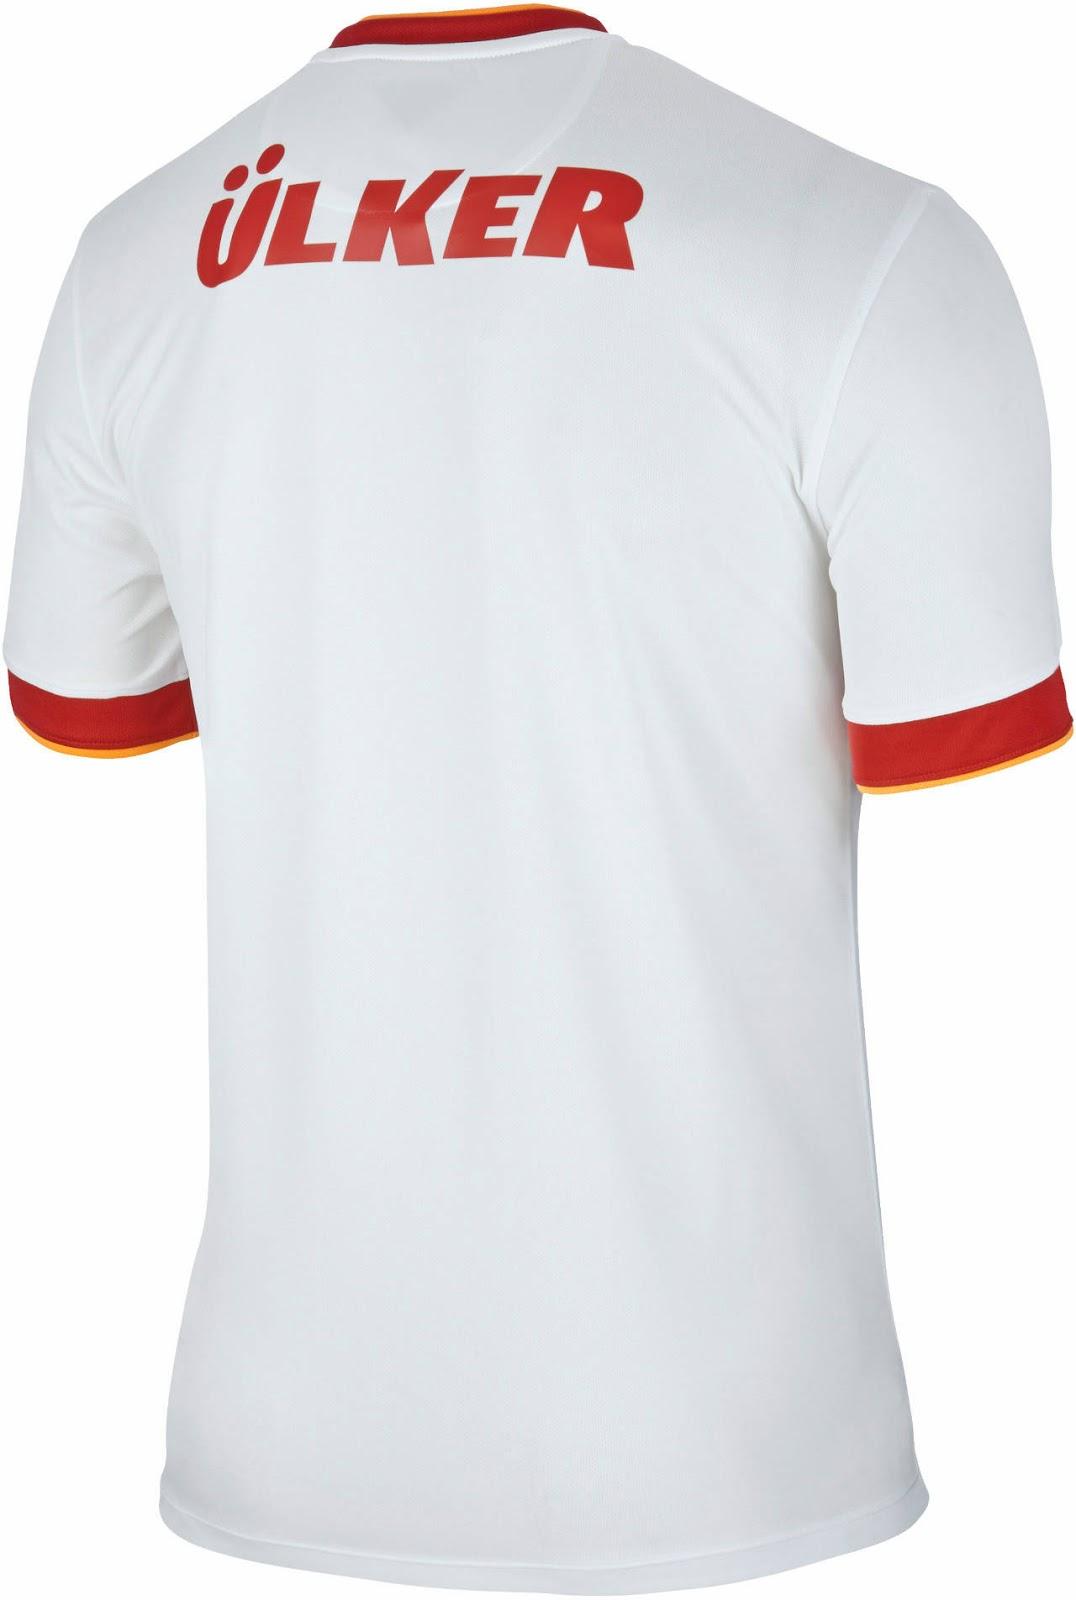 http://2.bp.blogspot.com/-hPybIwOoaAw/U8jcyJa0fSI/AAAAAAAAUYg/kixRspUvih4/s1600/Galatasaray-14-15-Away-Kit+(2).jpg